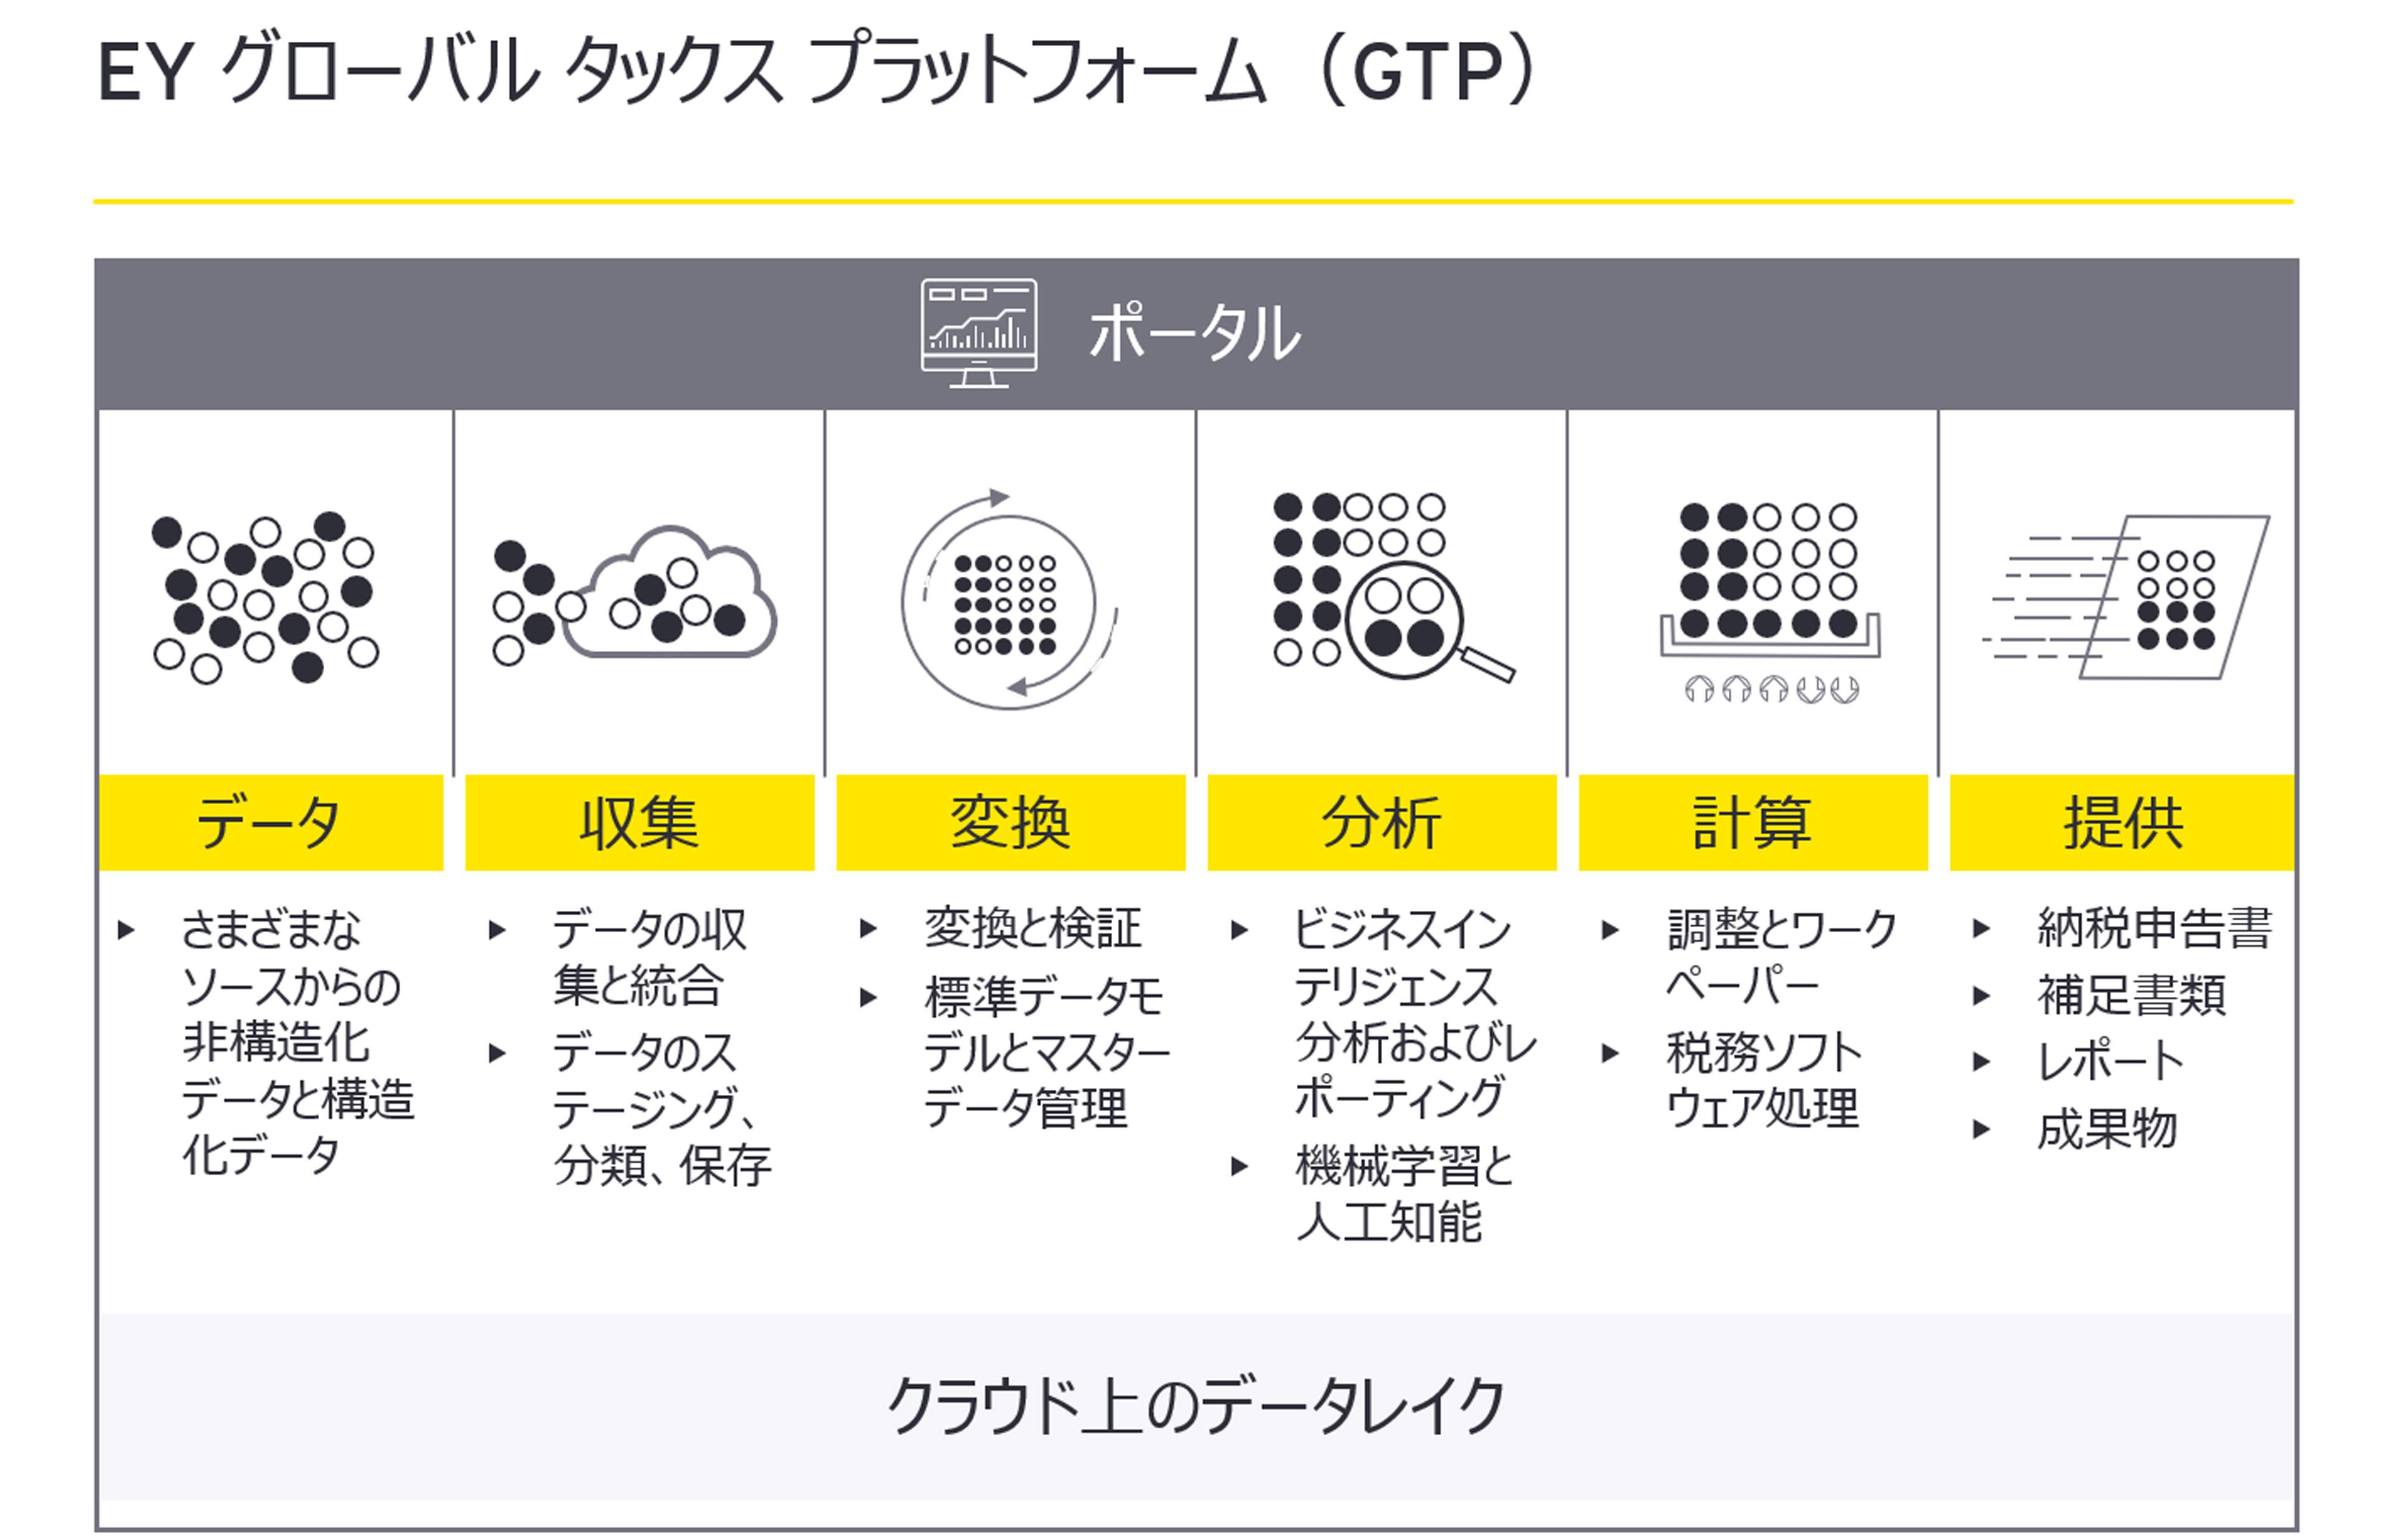 EY Gloal Tax Platform